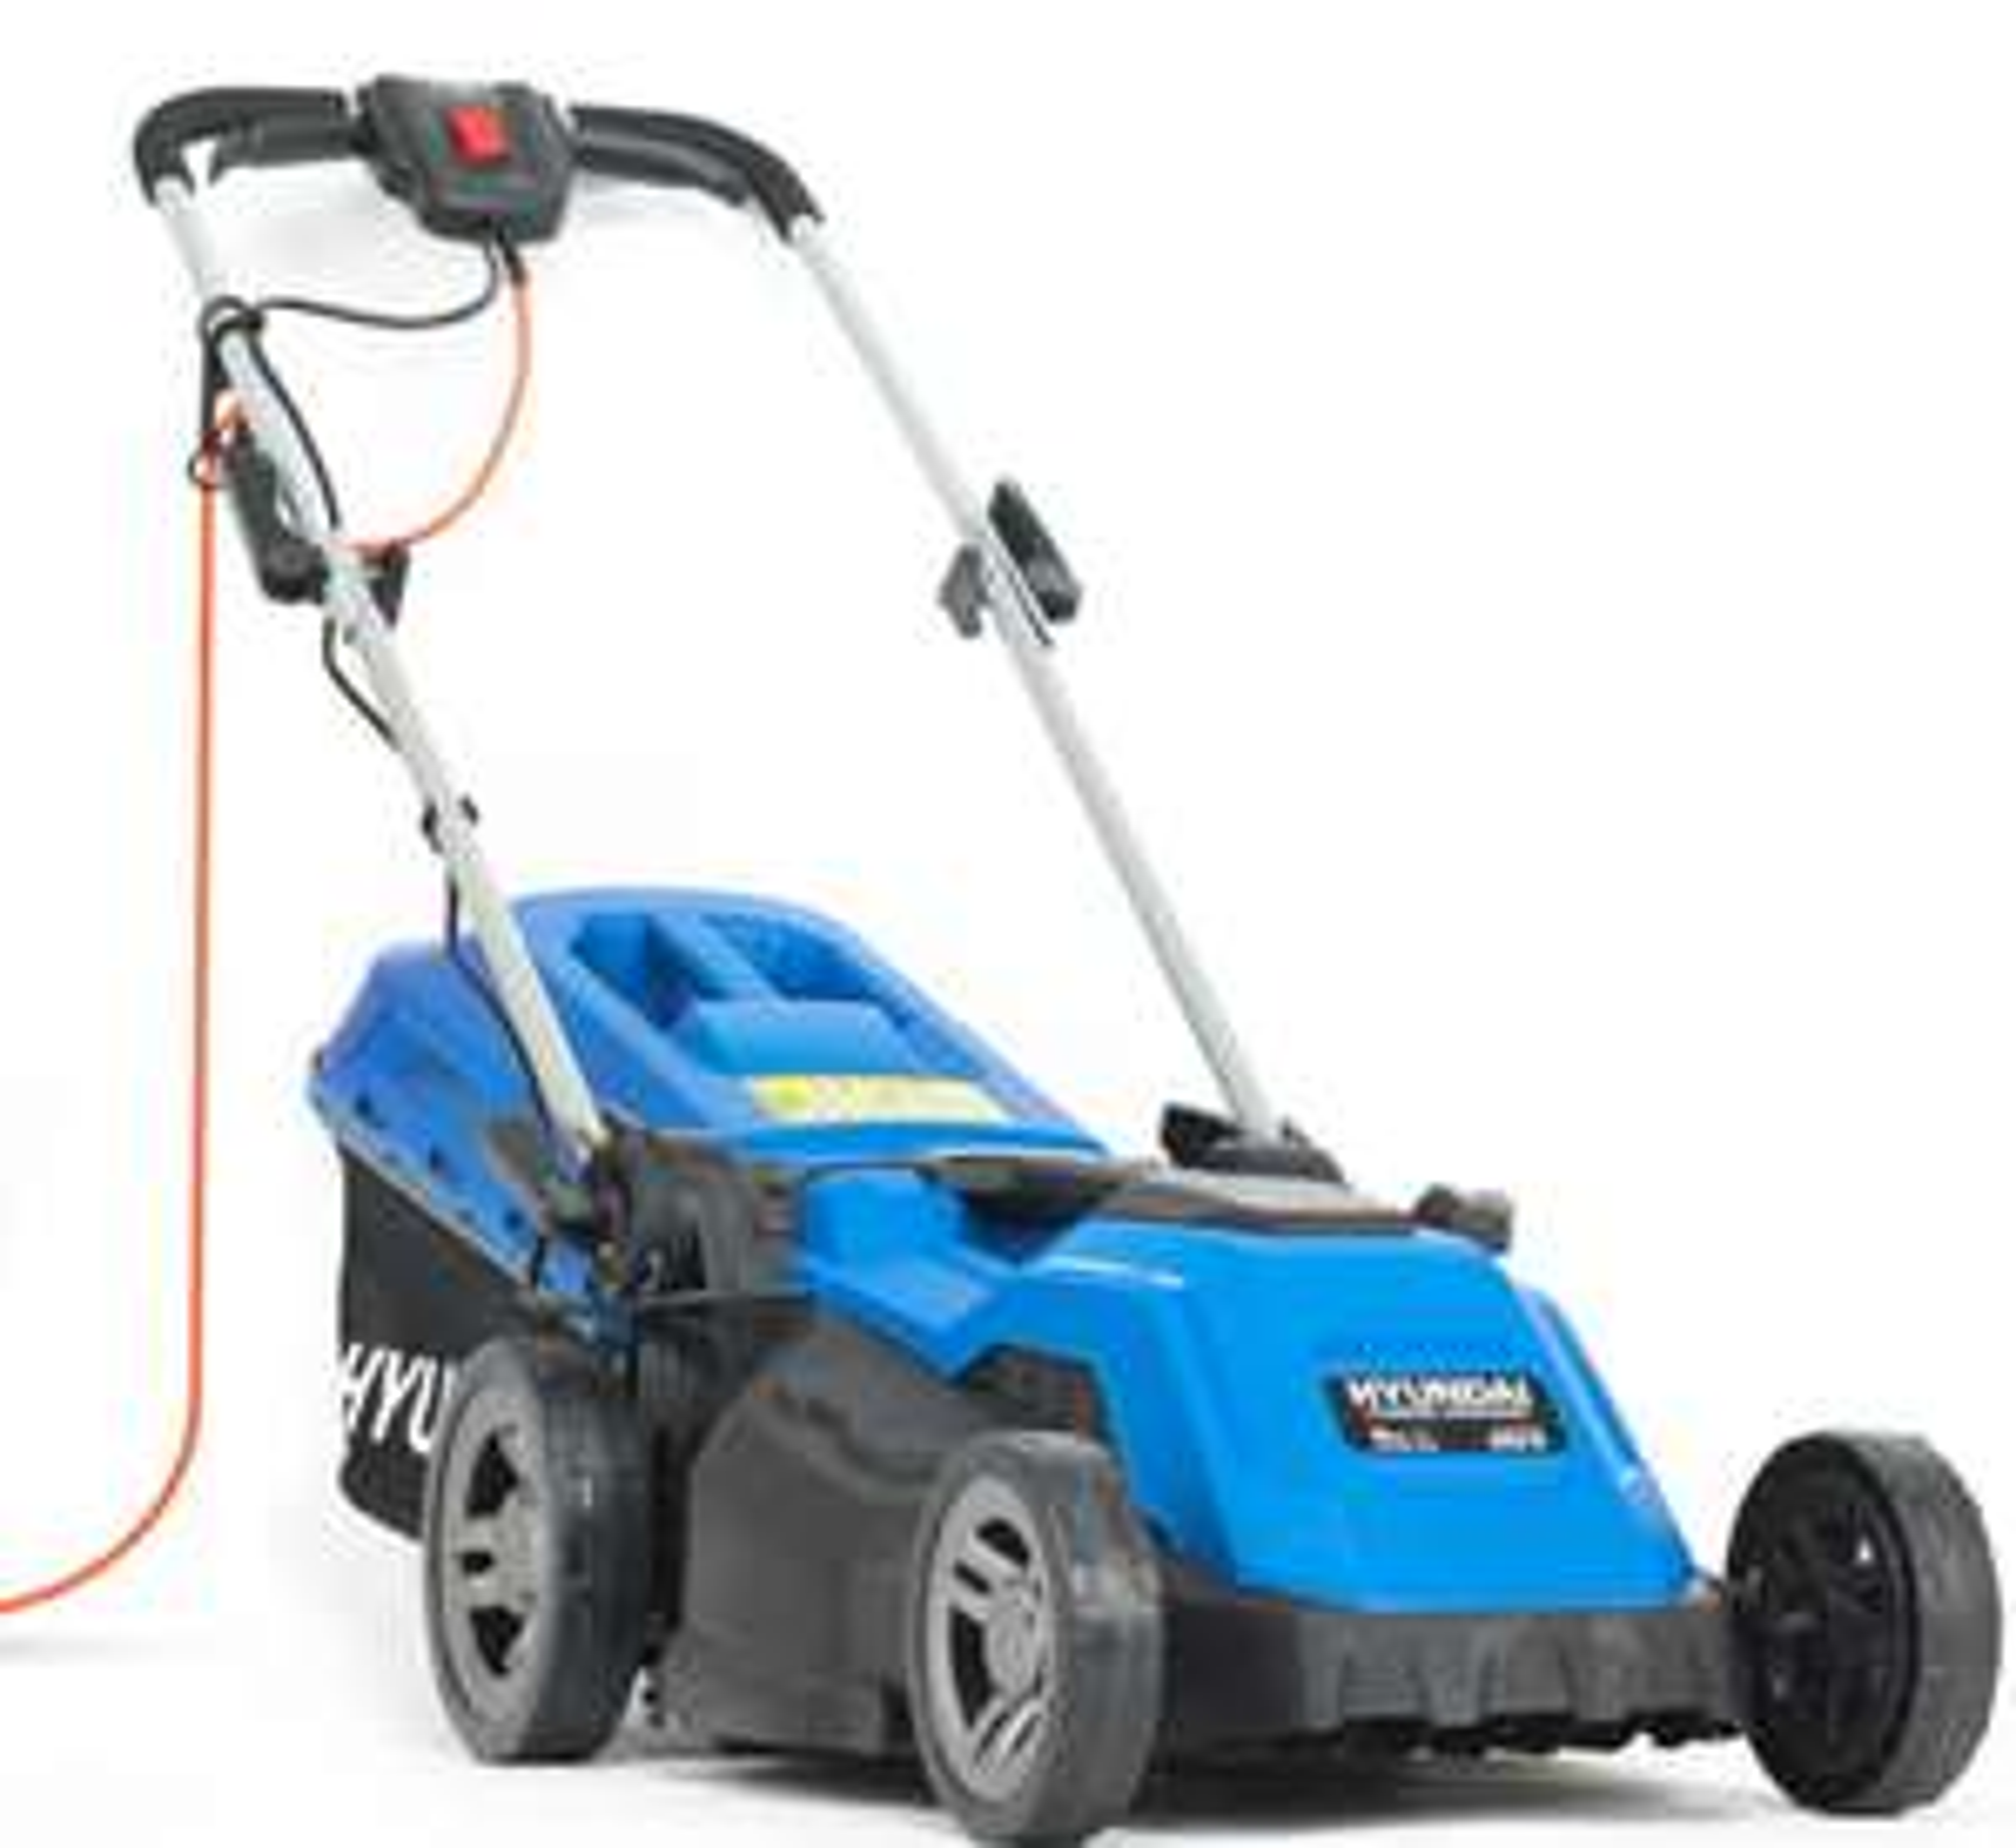 Hyundai HYM3800E Electric 1600W / 230V 38cm Rotary Rear Roller Mulching Lawnmower - £103.54 With Code @ Hyundair Power Equipment